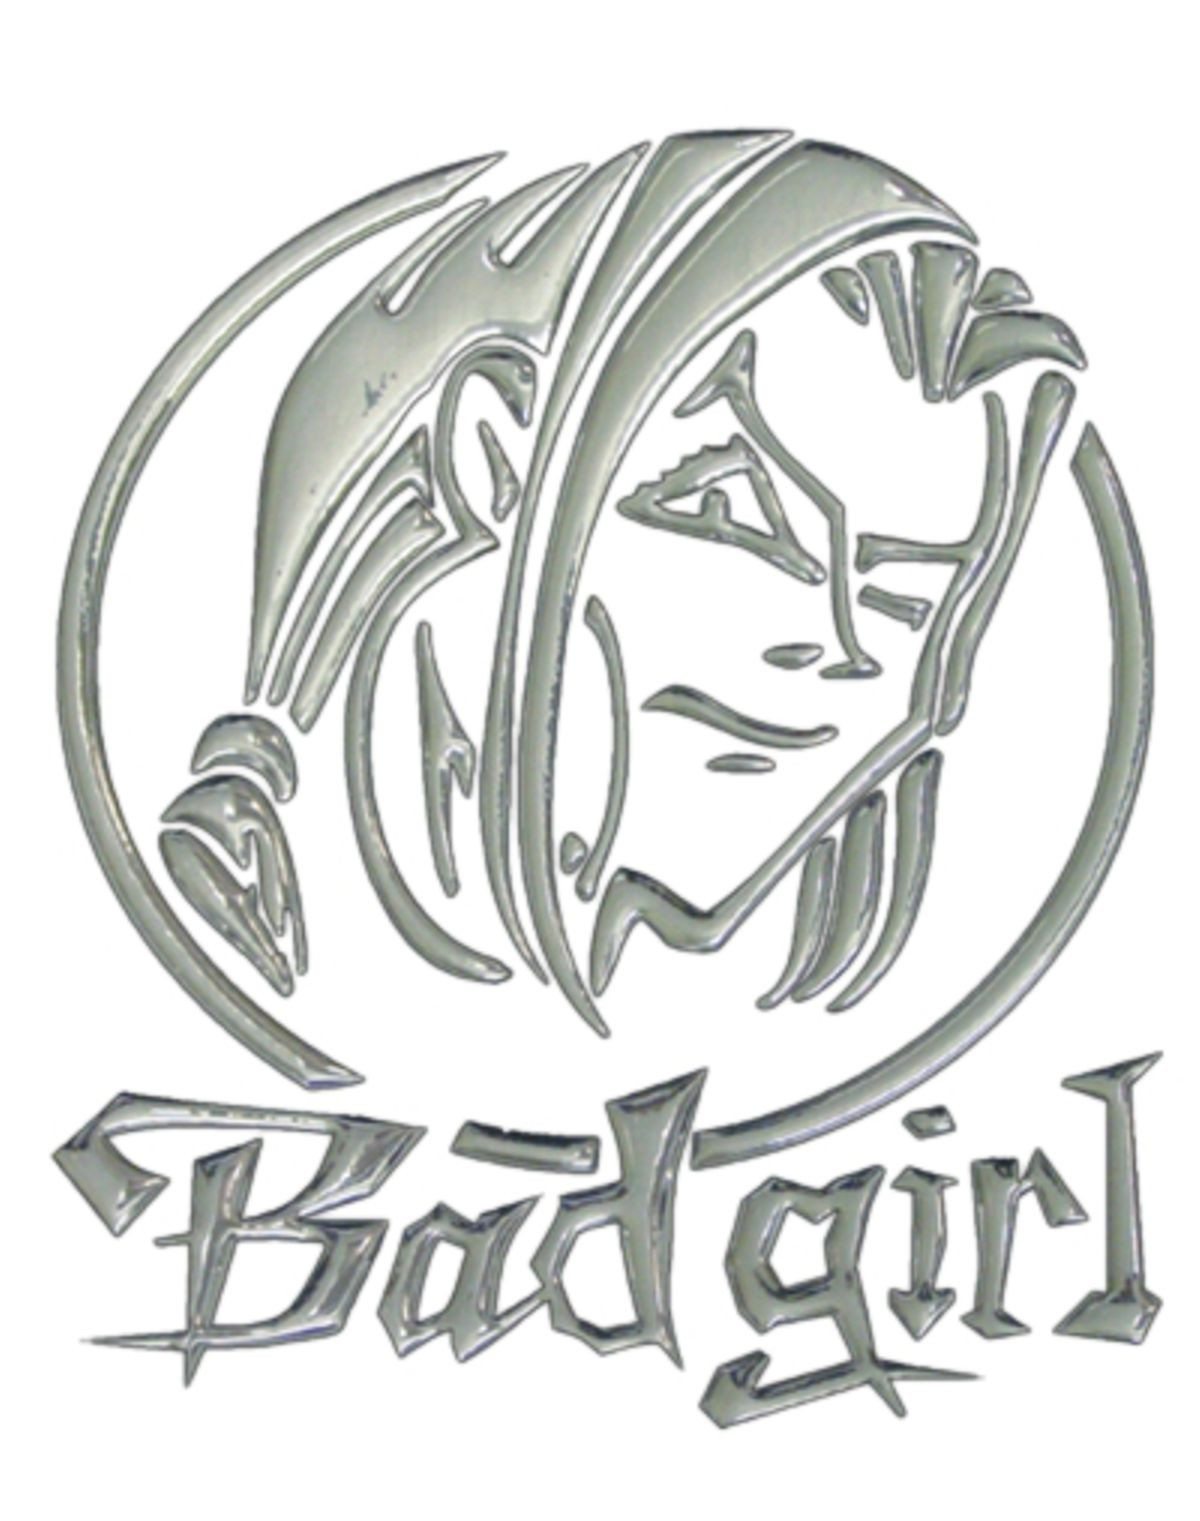 3D-Chrome-Sticker Bad Girl 200 x 165 mm